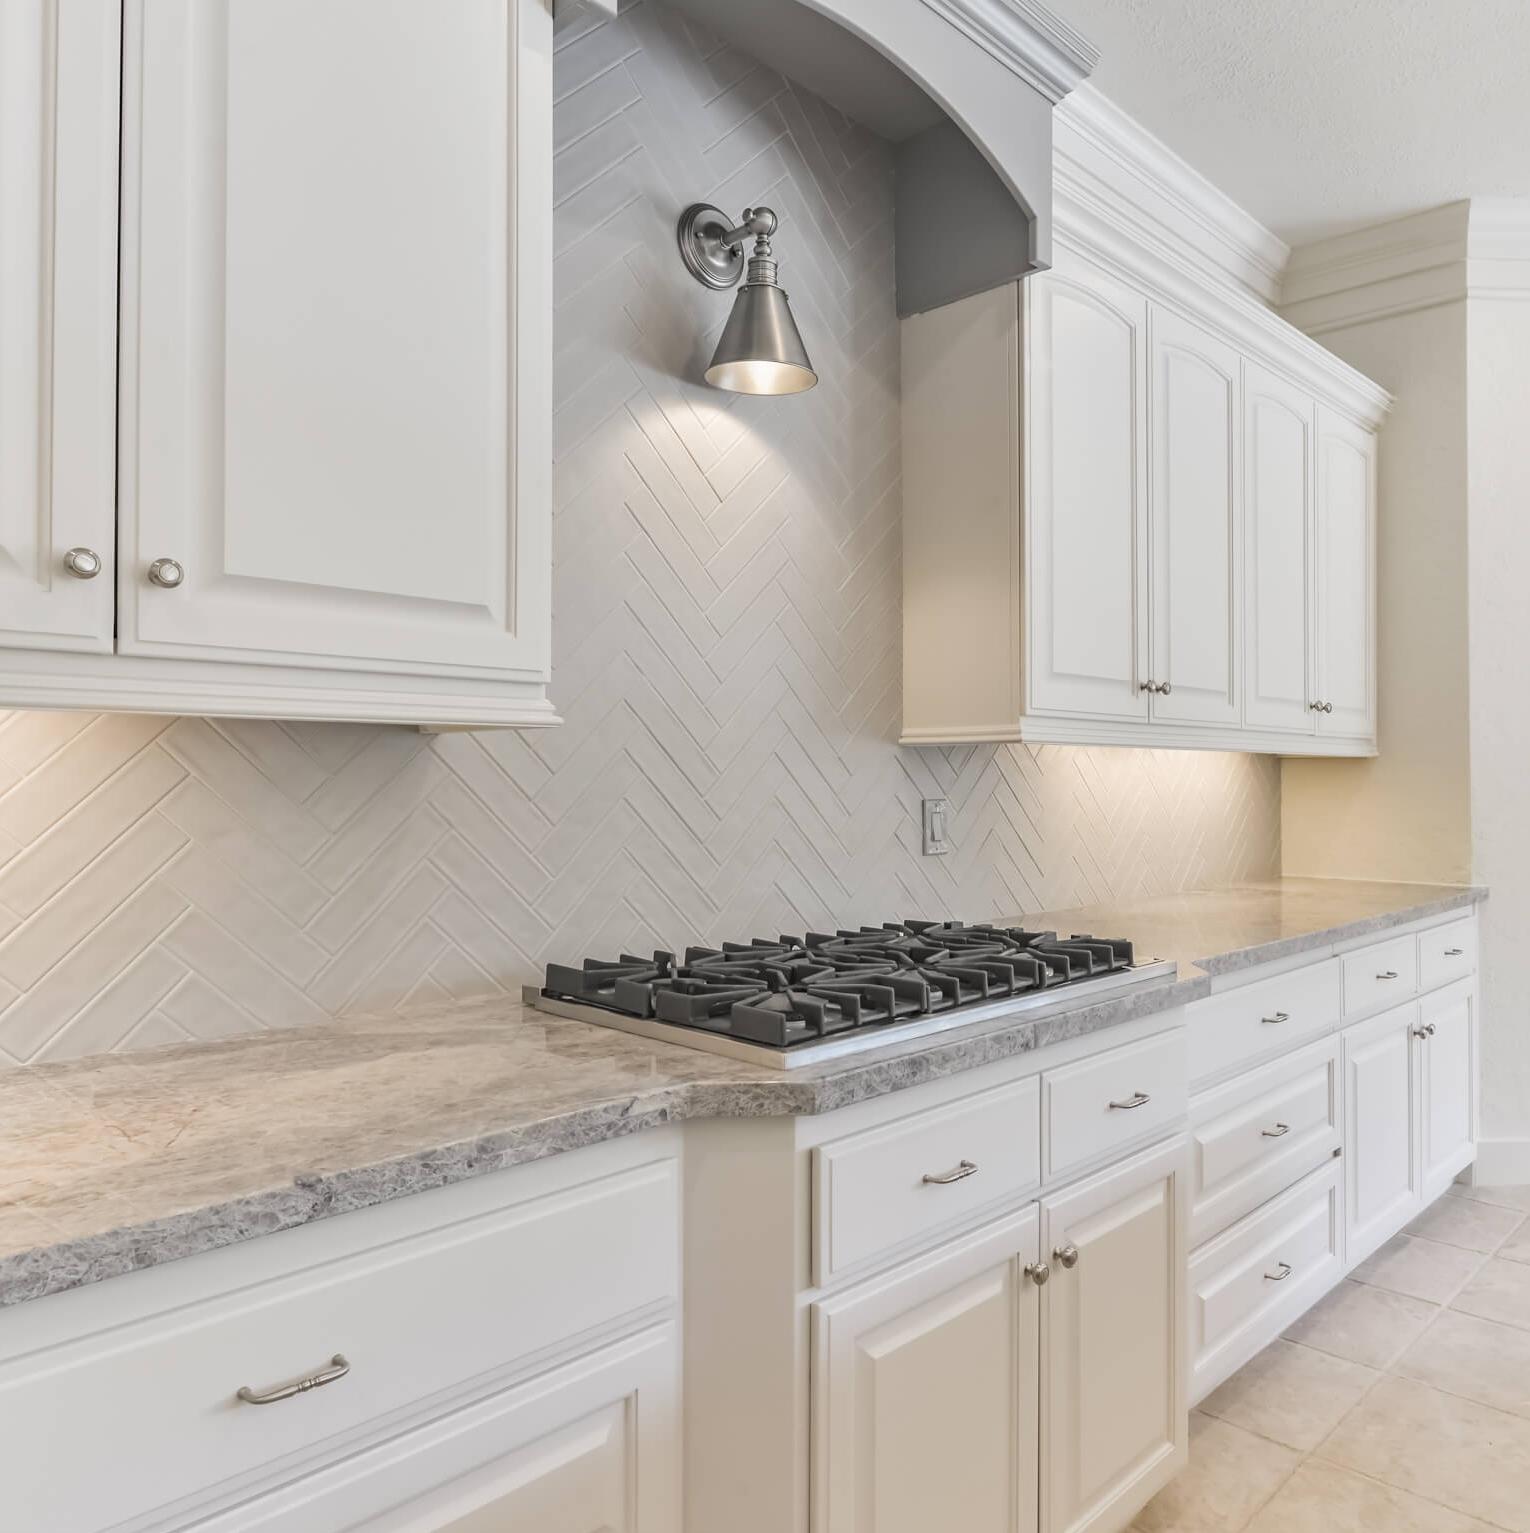 AFTER KITCHEN REMODEL - New countertops, backsplash, paint, cabinet pulls, lighting | Carla Aston, Designer #remodelingideas #remodel #kitchenremodel #herringbonebacksplash #grayandwhitekitchen